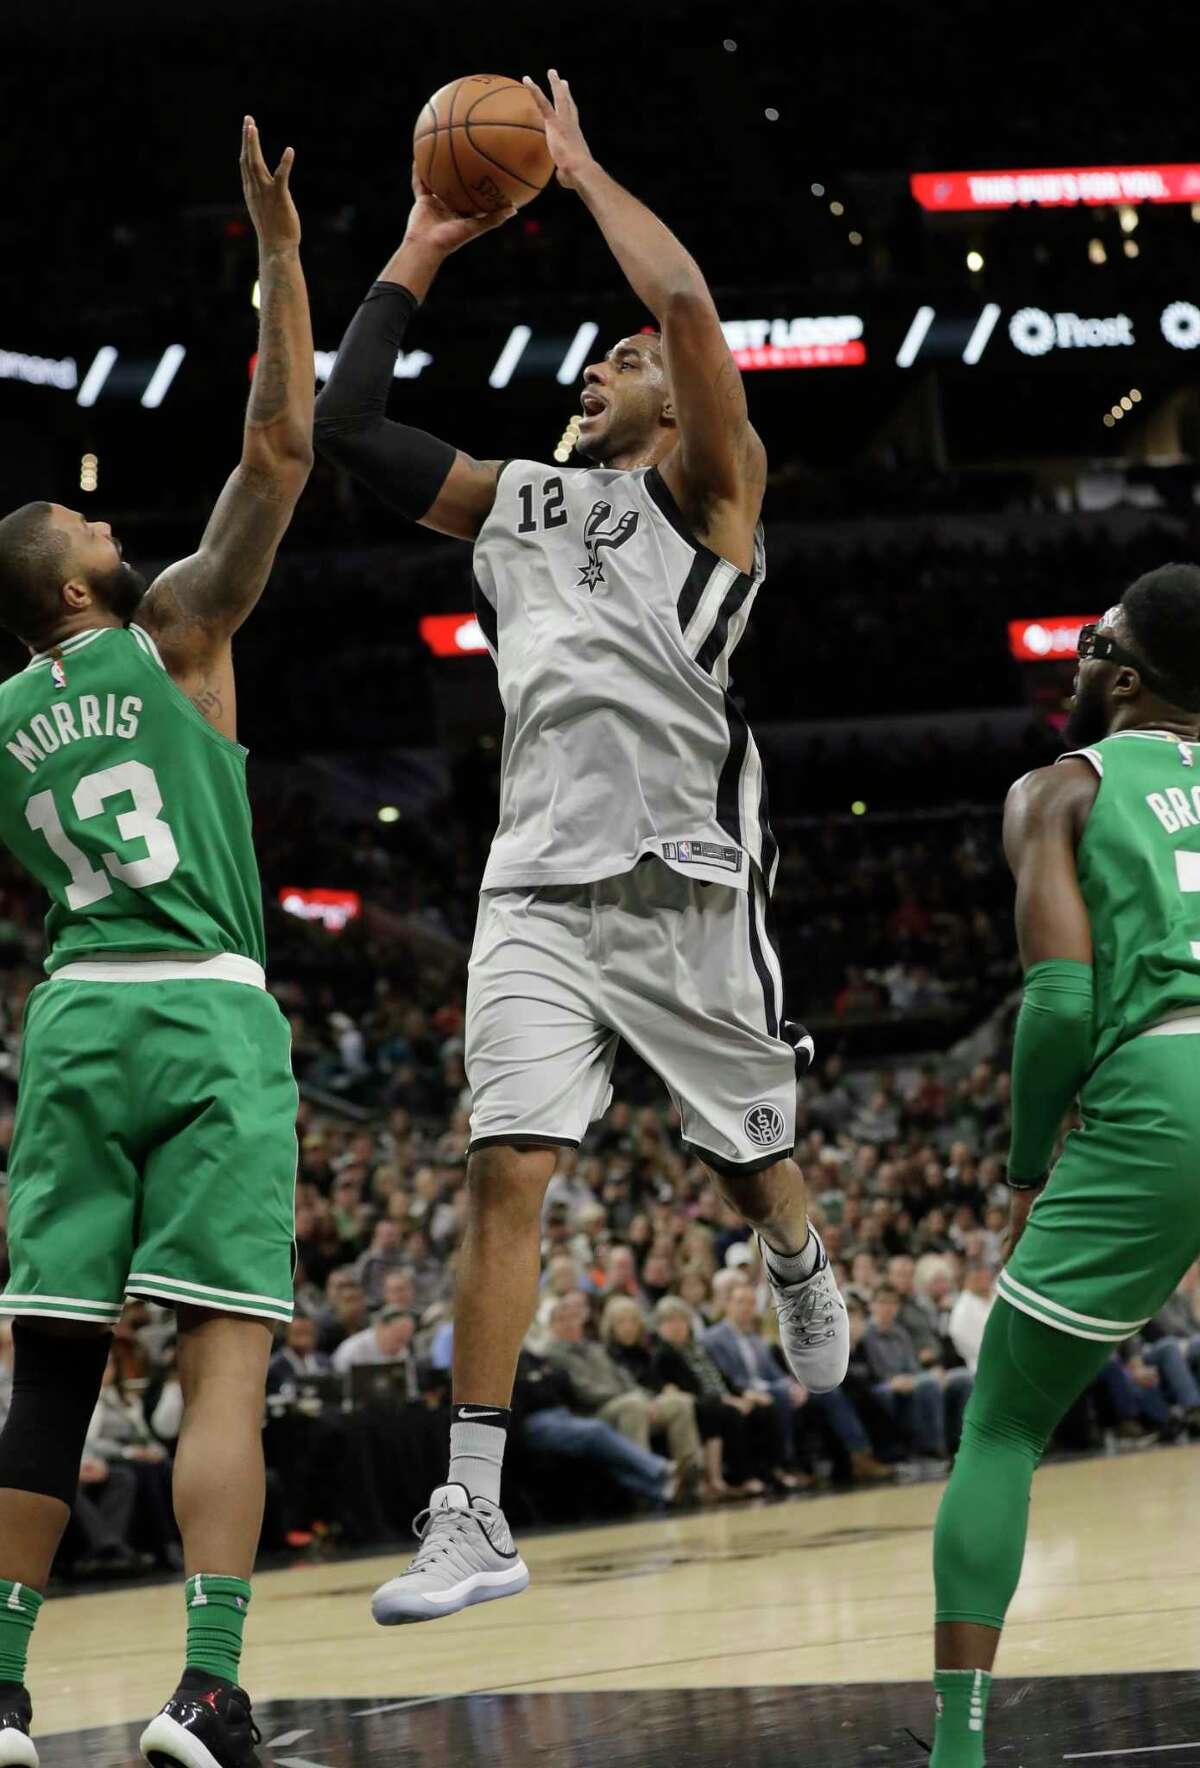 San Antonio Spurs forward LaMarcus Aldridge (12) shoots over Boston Celtics forward Marcus Morris (13) during the first half of an NBA basketball game Friday, Dec. 8, 2017, in San Antonio. (AP Photo/Eric Gay)